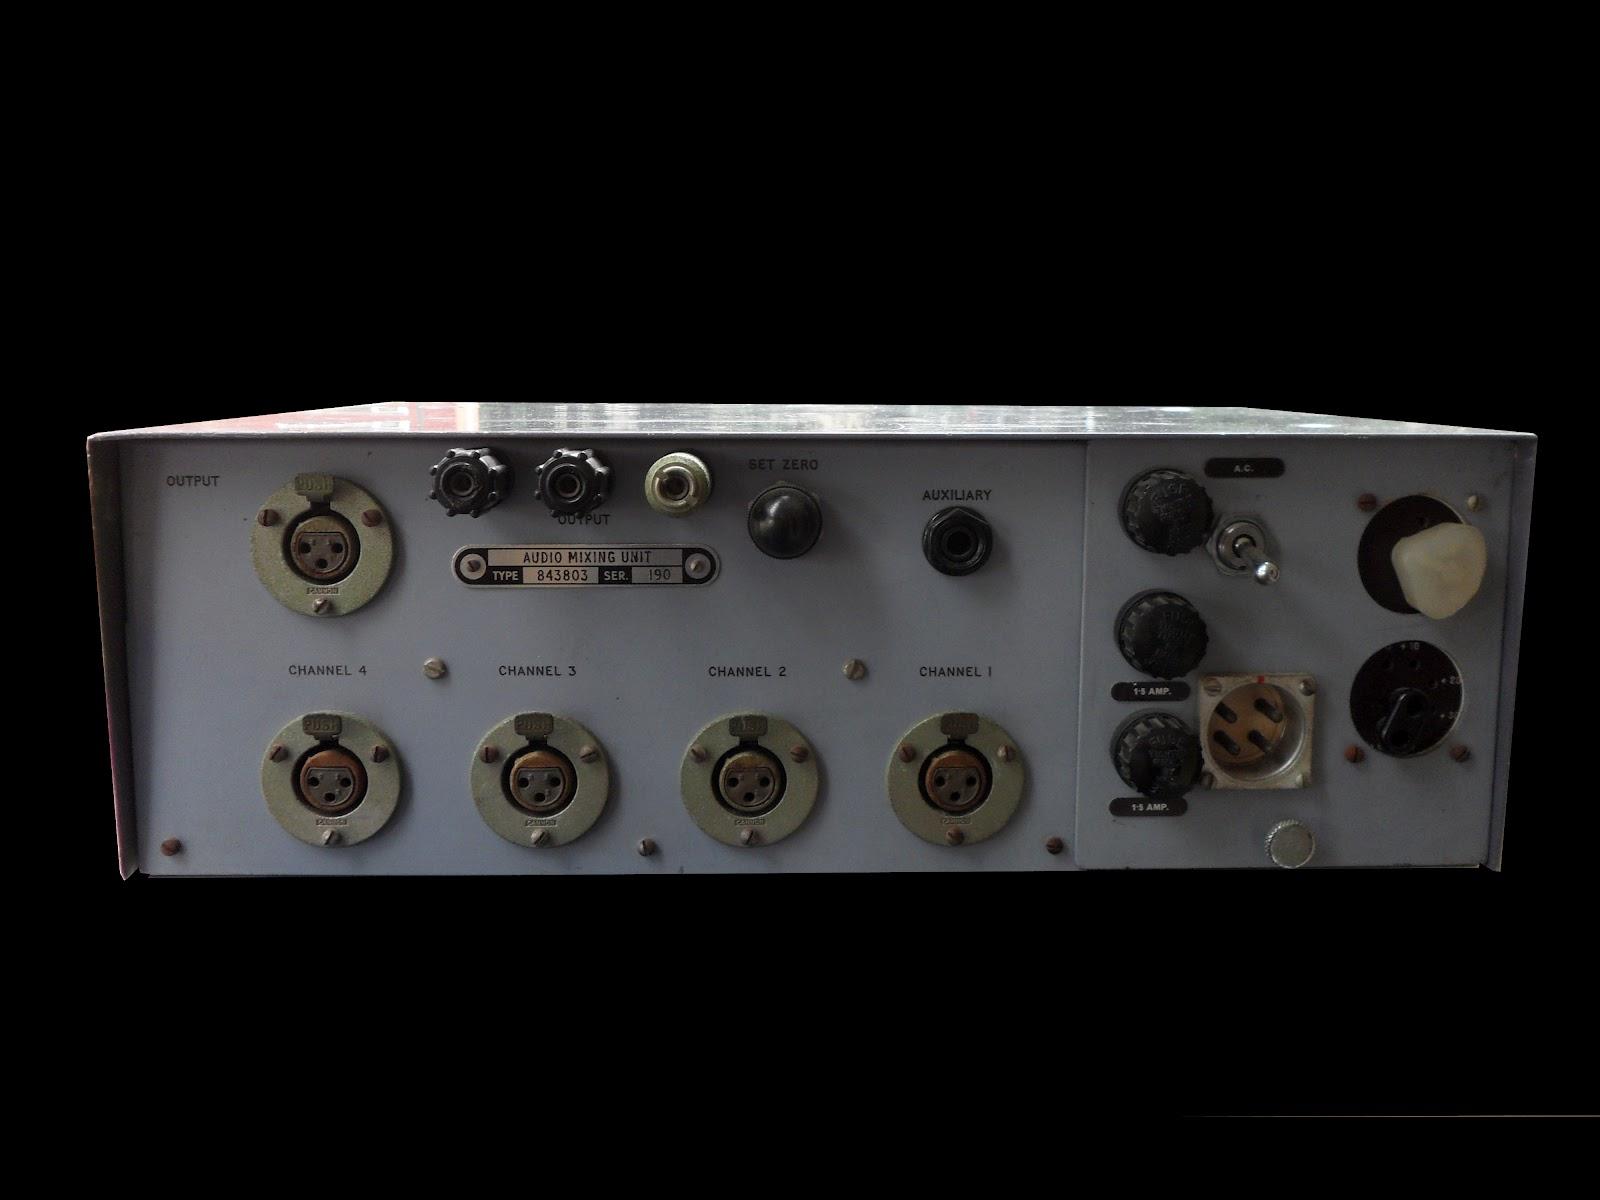 Audio Mixer Circuit Diagram Pcb Trusted Wiring Bufferedbreakoutbox Basiccircuit Seekiccom Bbc Schematic Basic Guide U2022 Ic